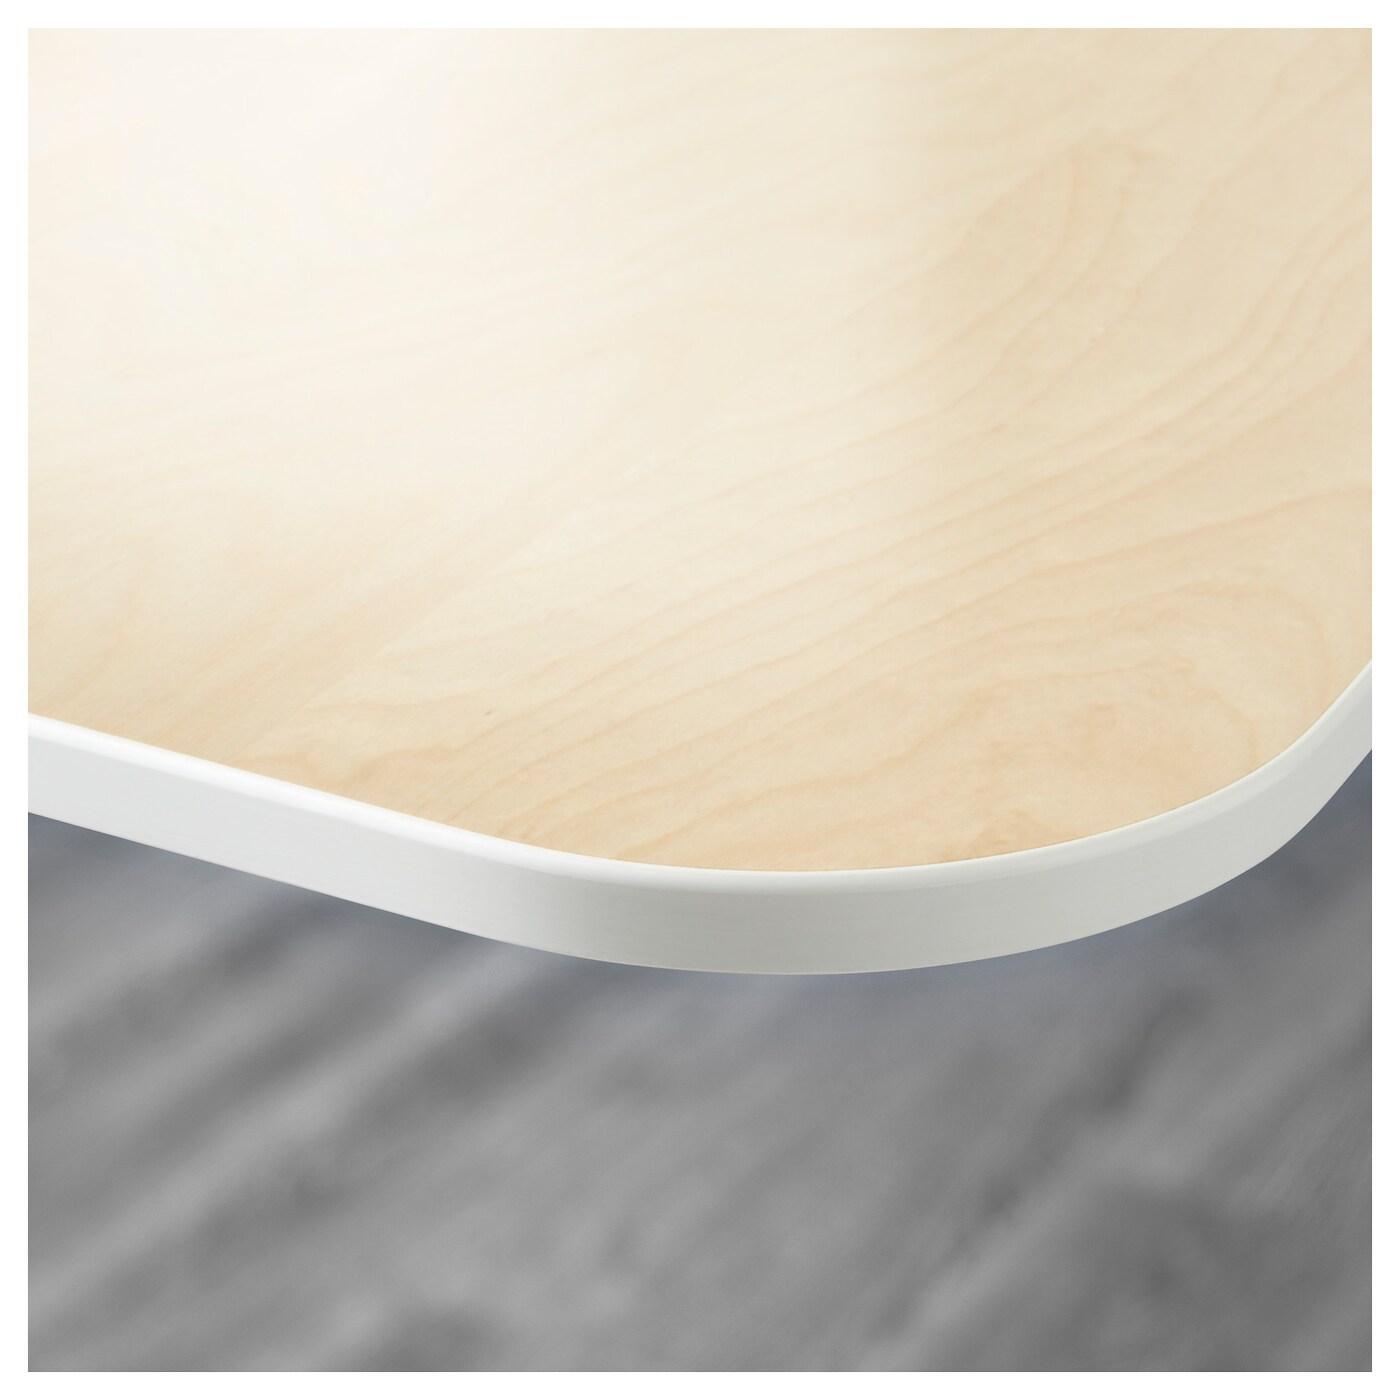 bekant bureau assis debout av cran plaqu bouleau blanc 160x160 120 cm ikea. Black Bedroom Furniture Sets. Home Design Ideas